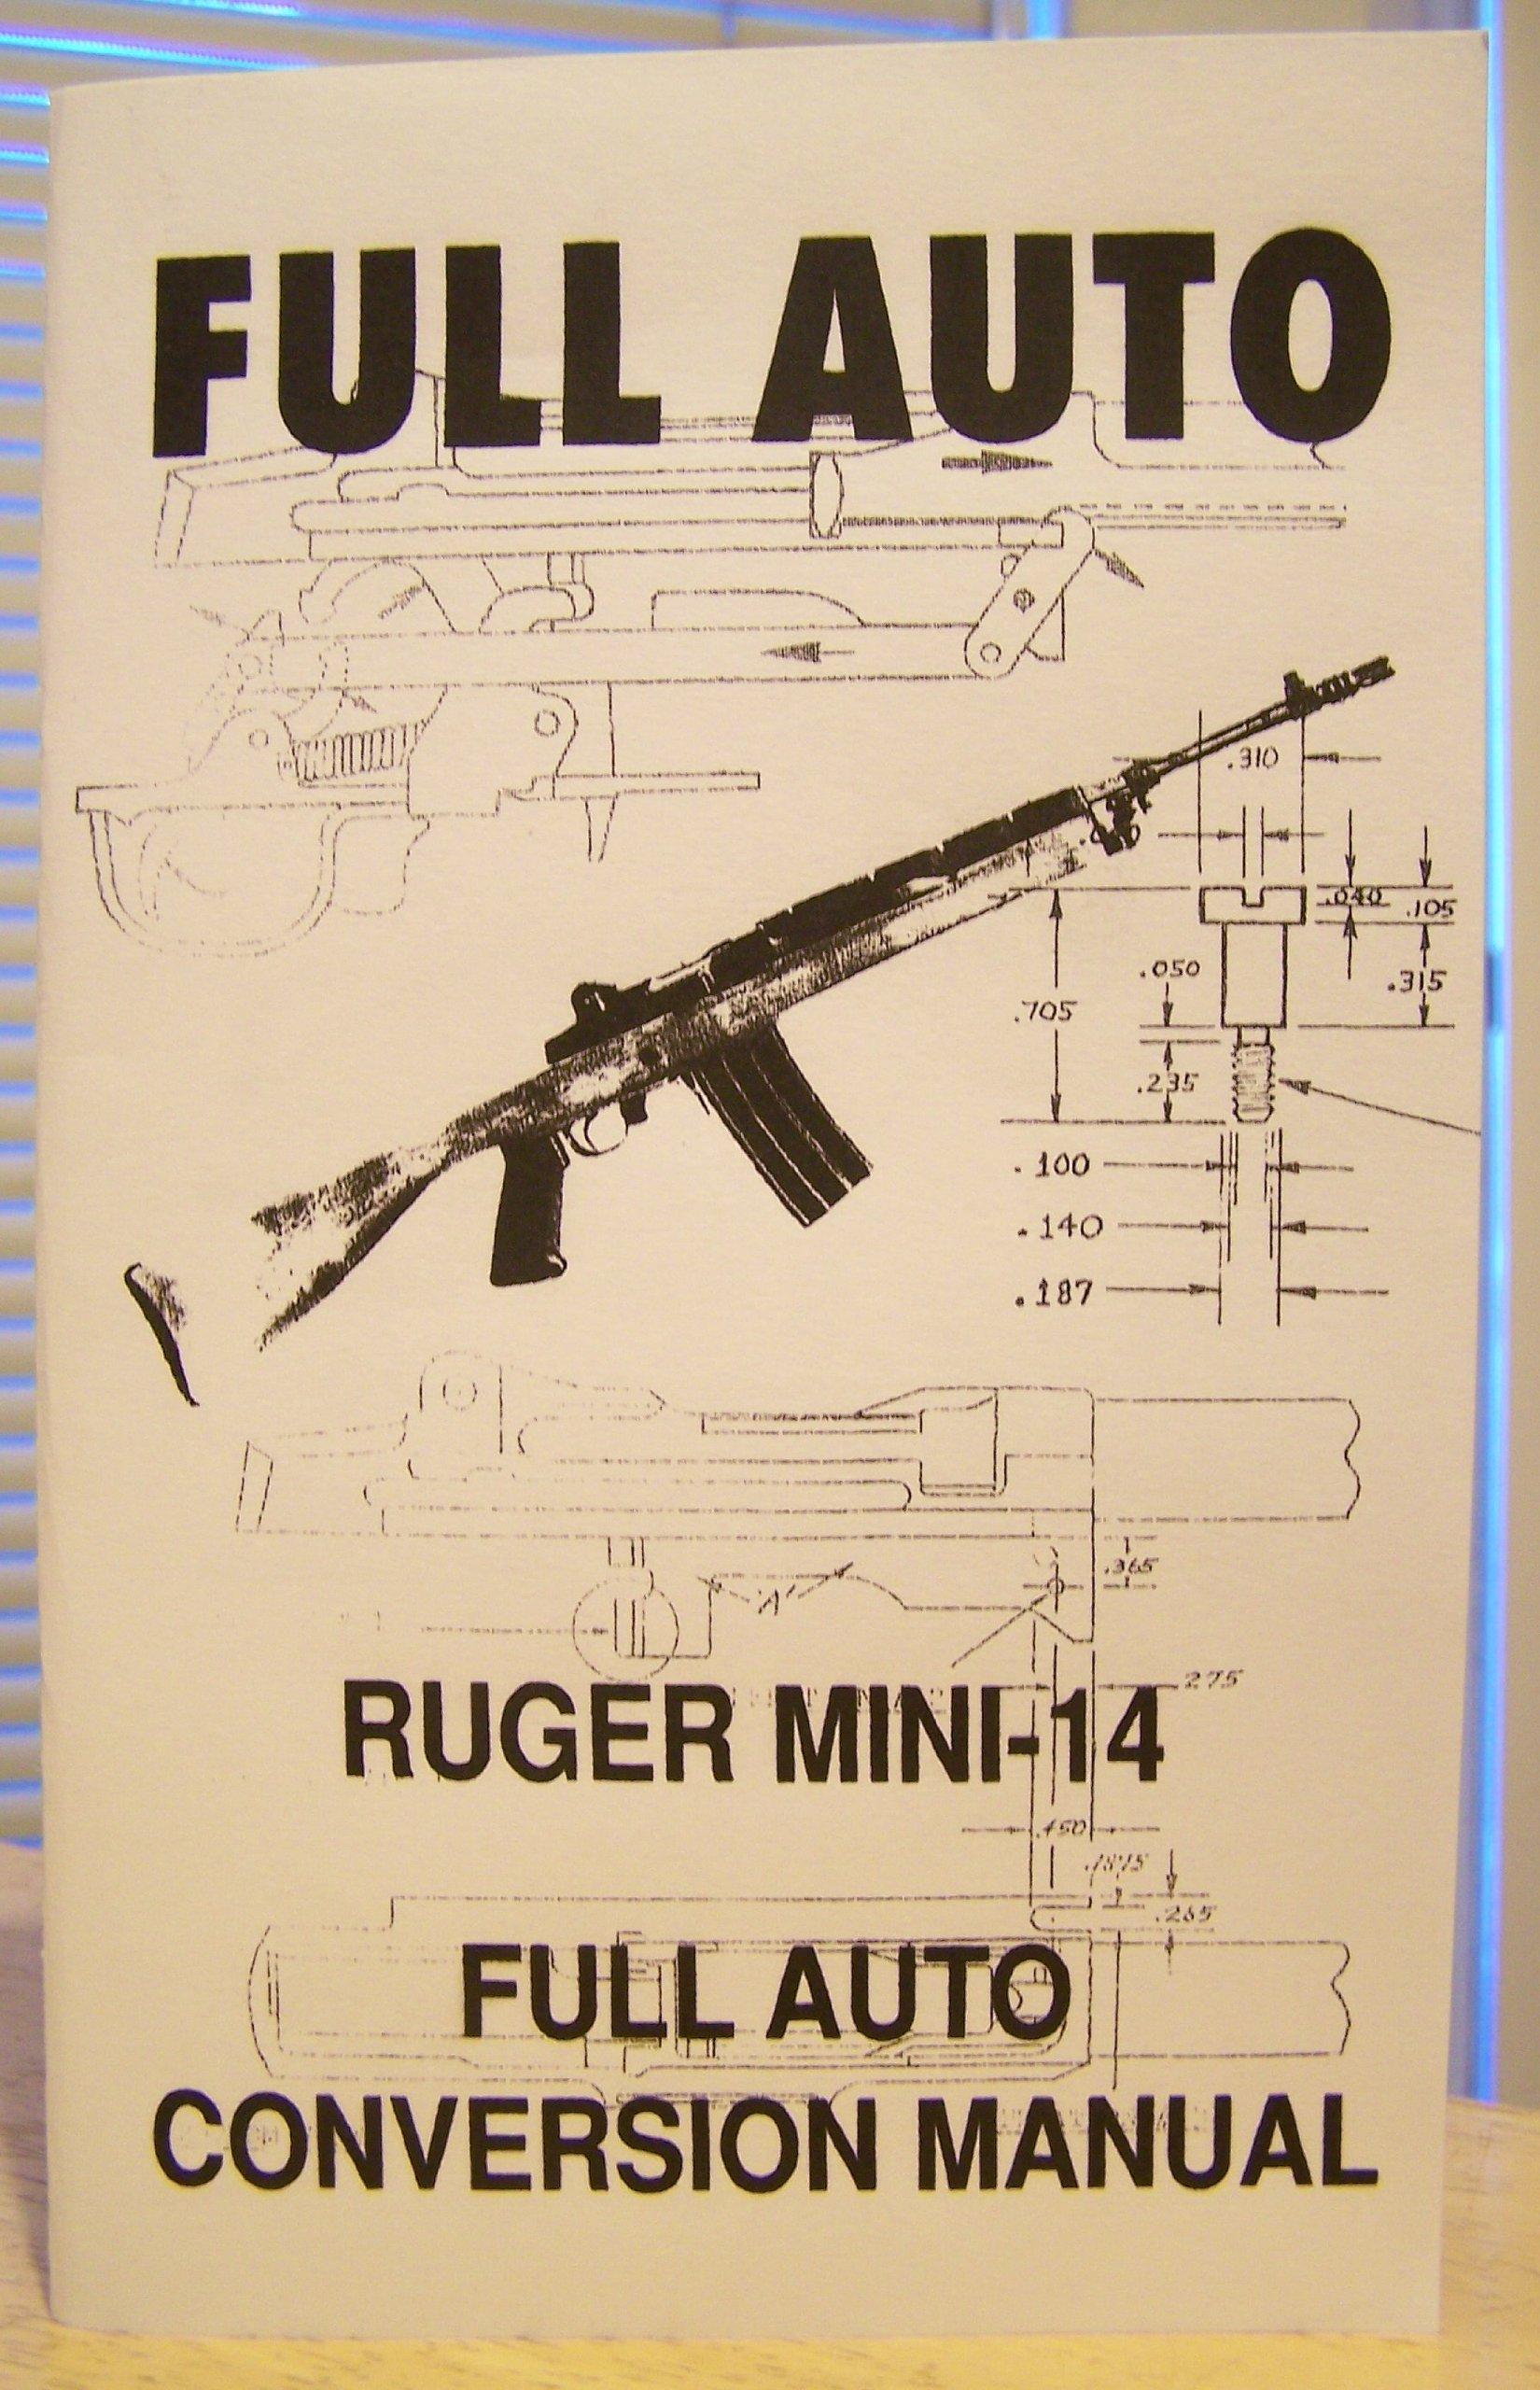 RUGER MINI 14 FULL AUTO CONVERSION MANUAL SELECT FIRE MACHINE GUN  SURVIVALIST PREPPERS BOOK: NOT CITED: Amazon.com: Books